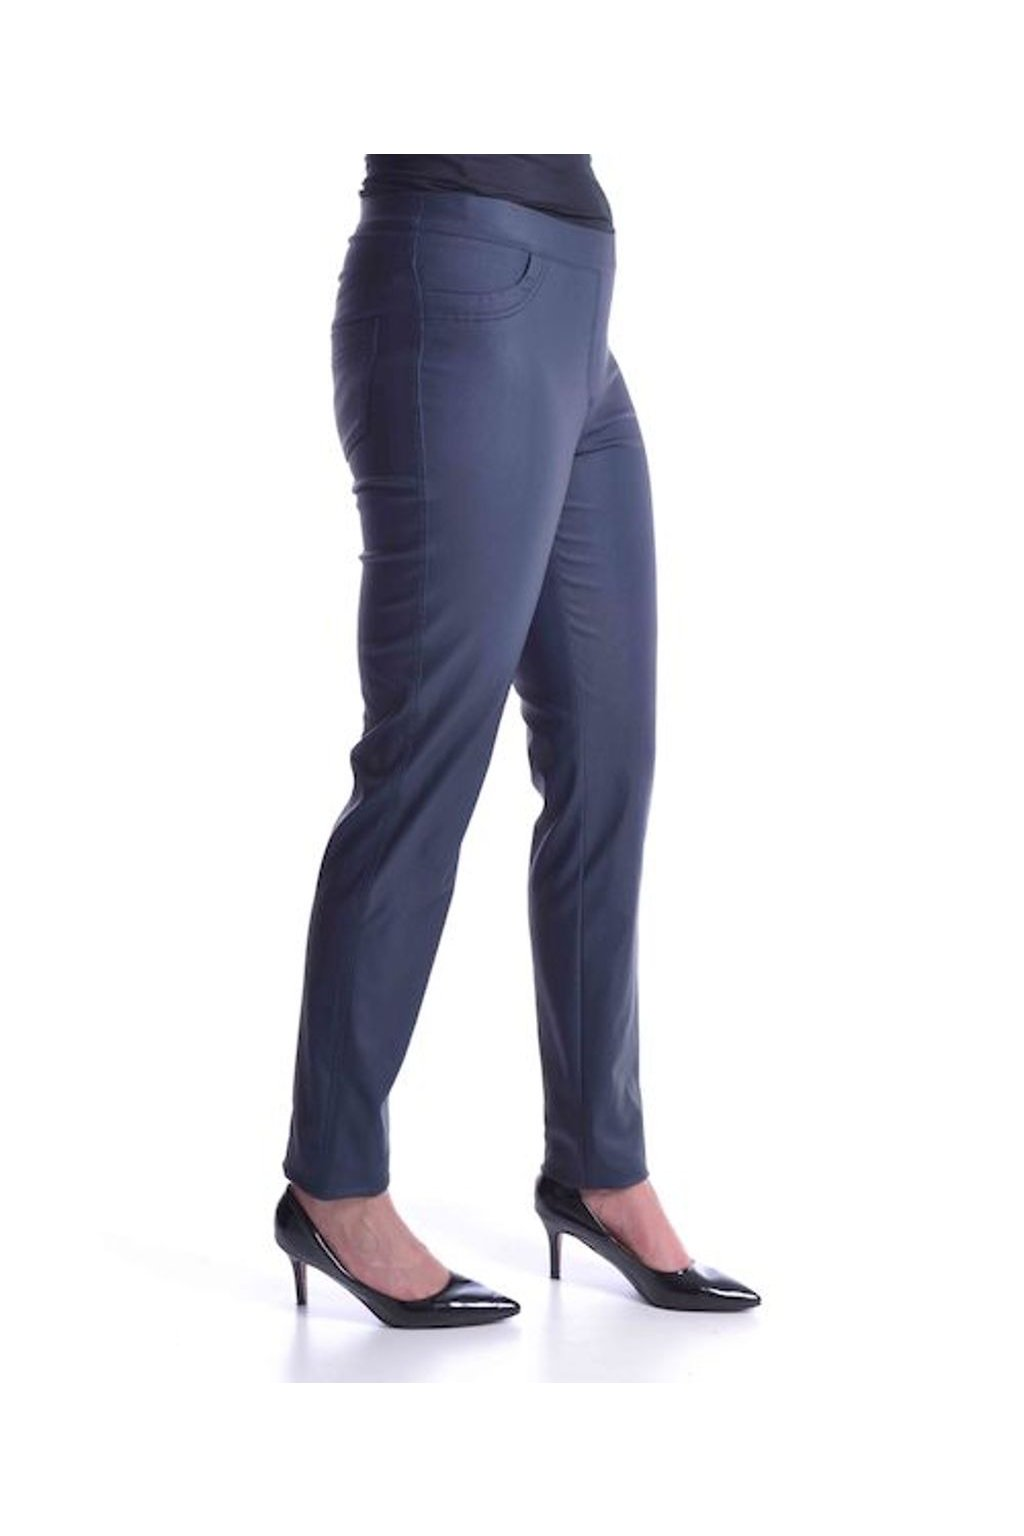 64T Kalhoty koženka (Velikost 36, Barva Modrá)